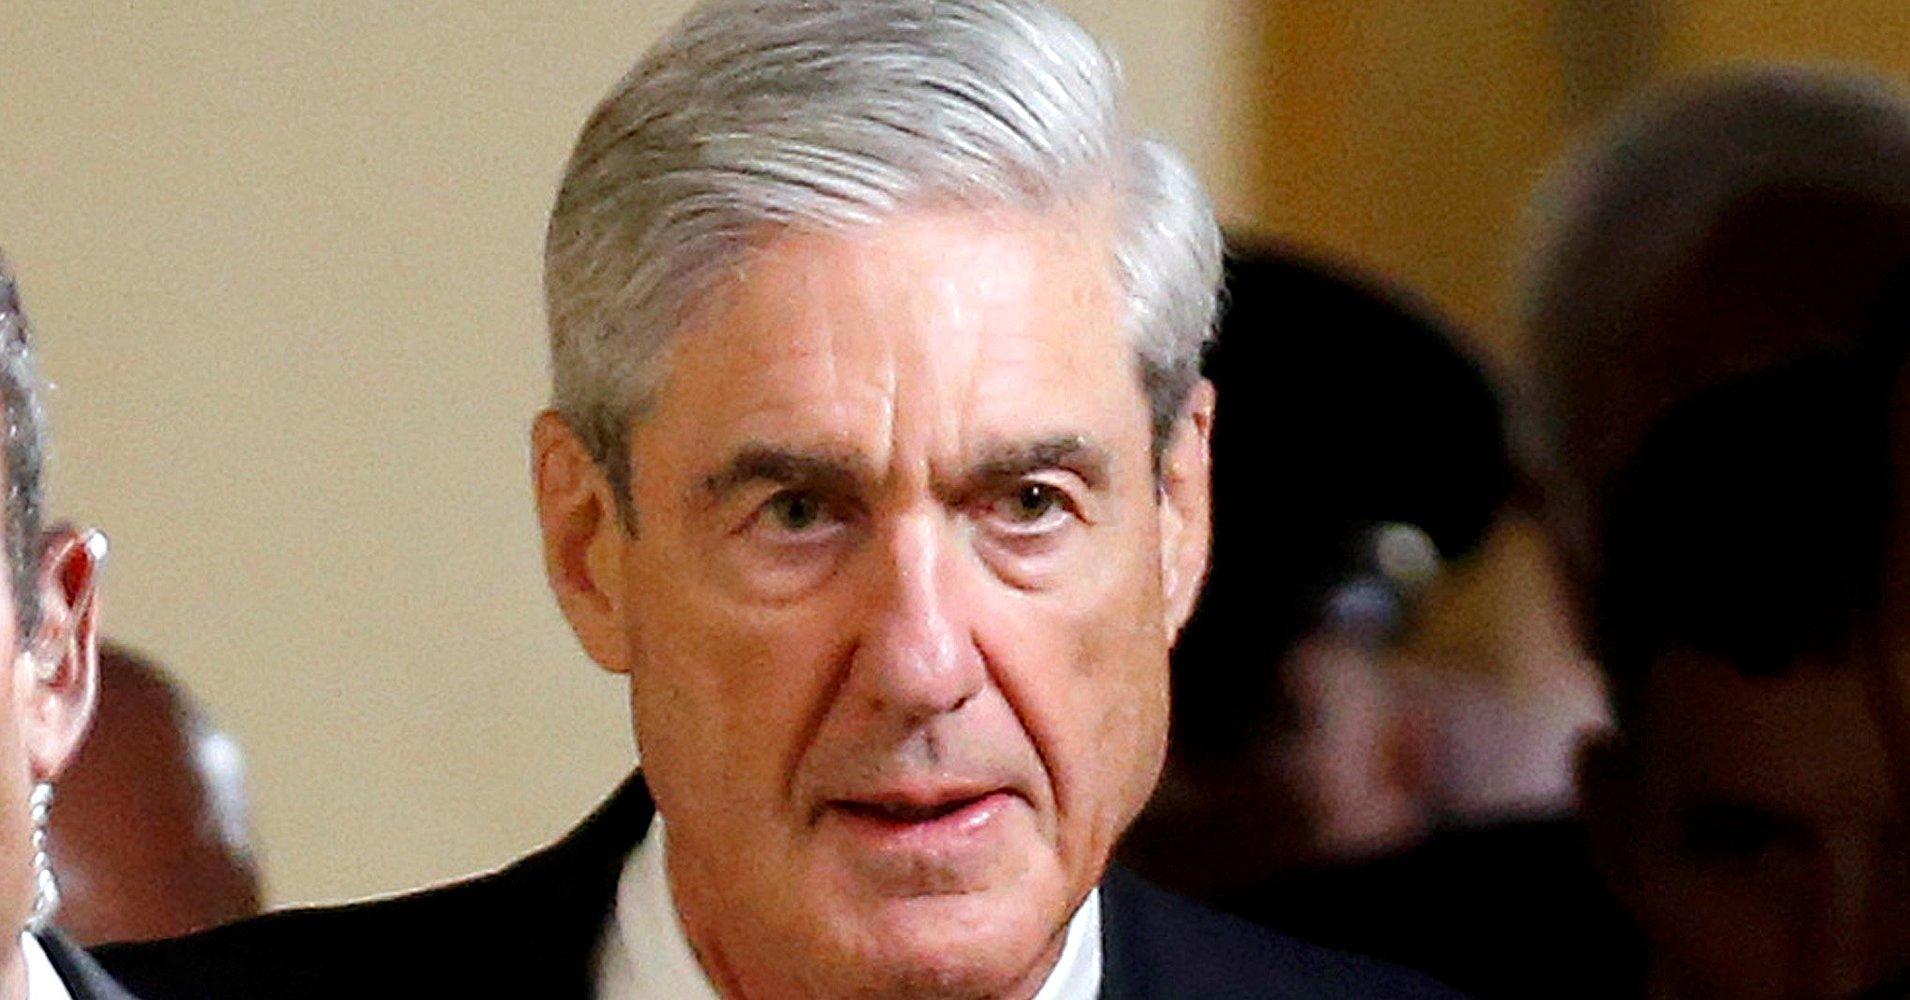 Former U.S. attorneys warn Trump about 'severe repercussions' of firing Robert Mueller https://t.co/OgqHv96nDw https://t.co/ILYSiZ78wU